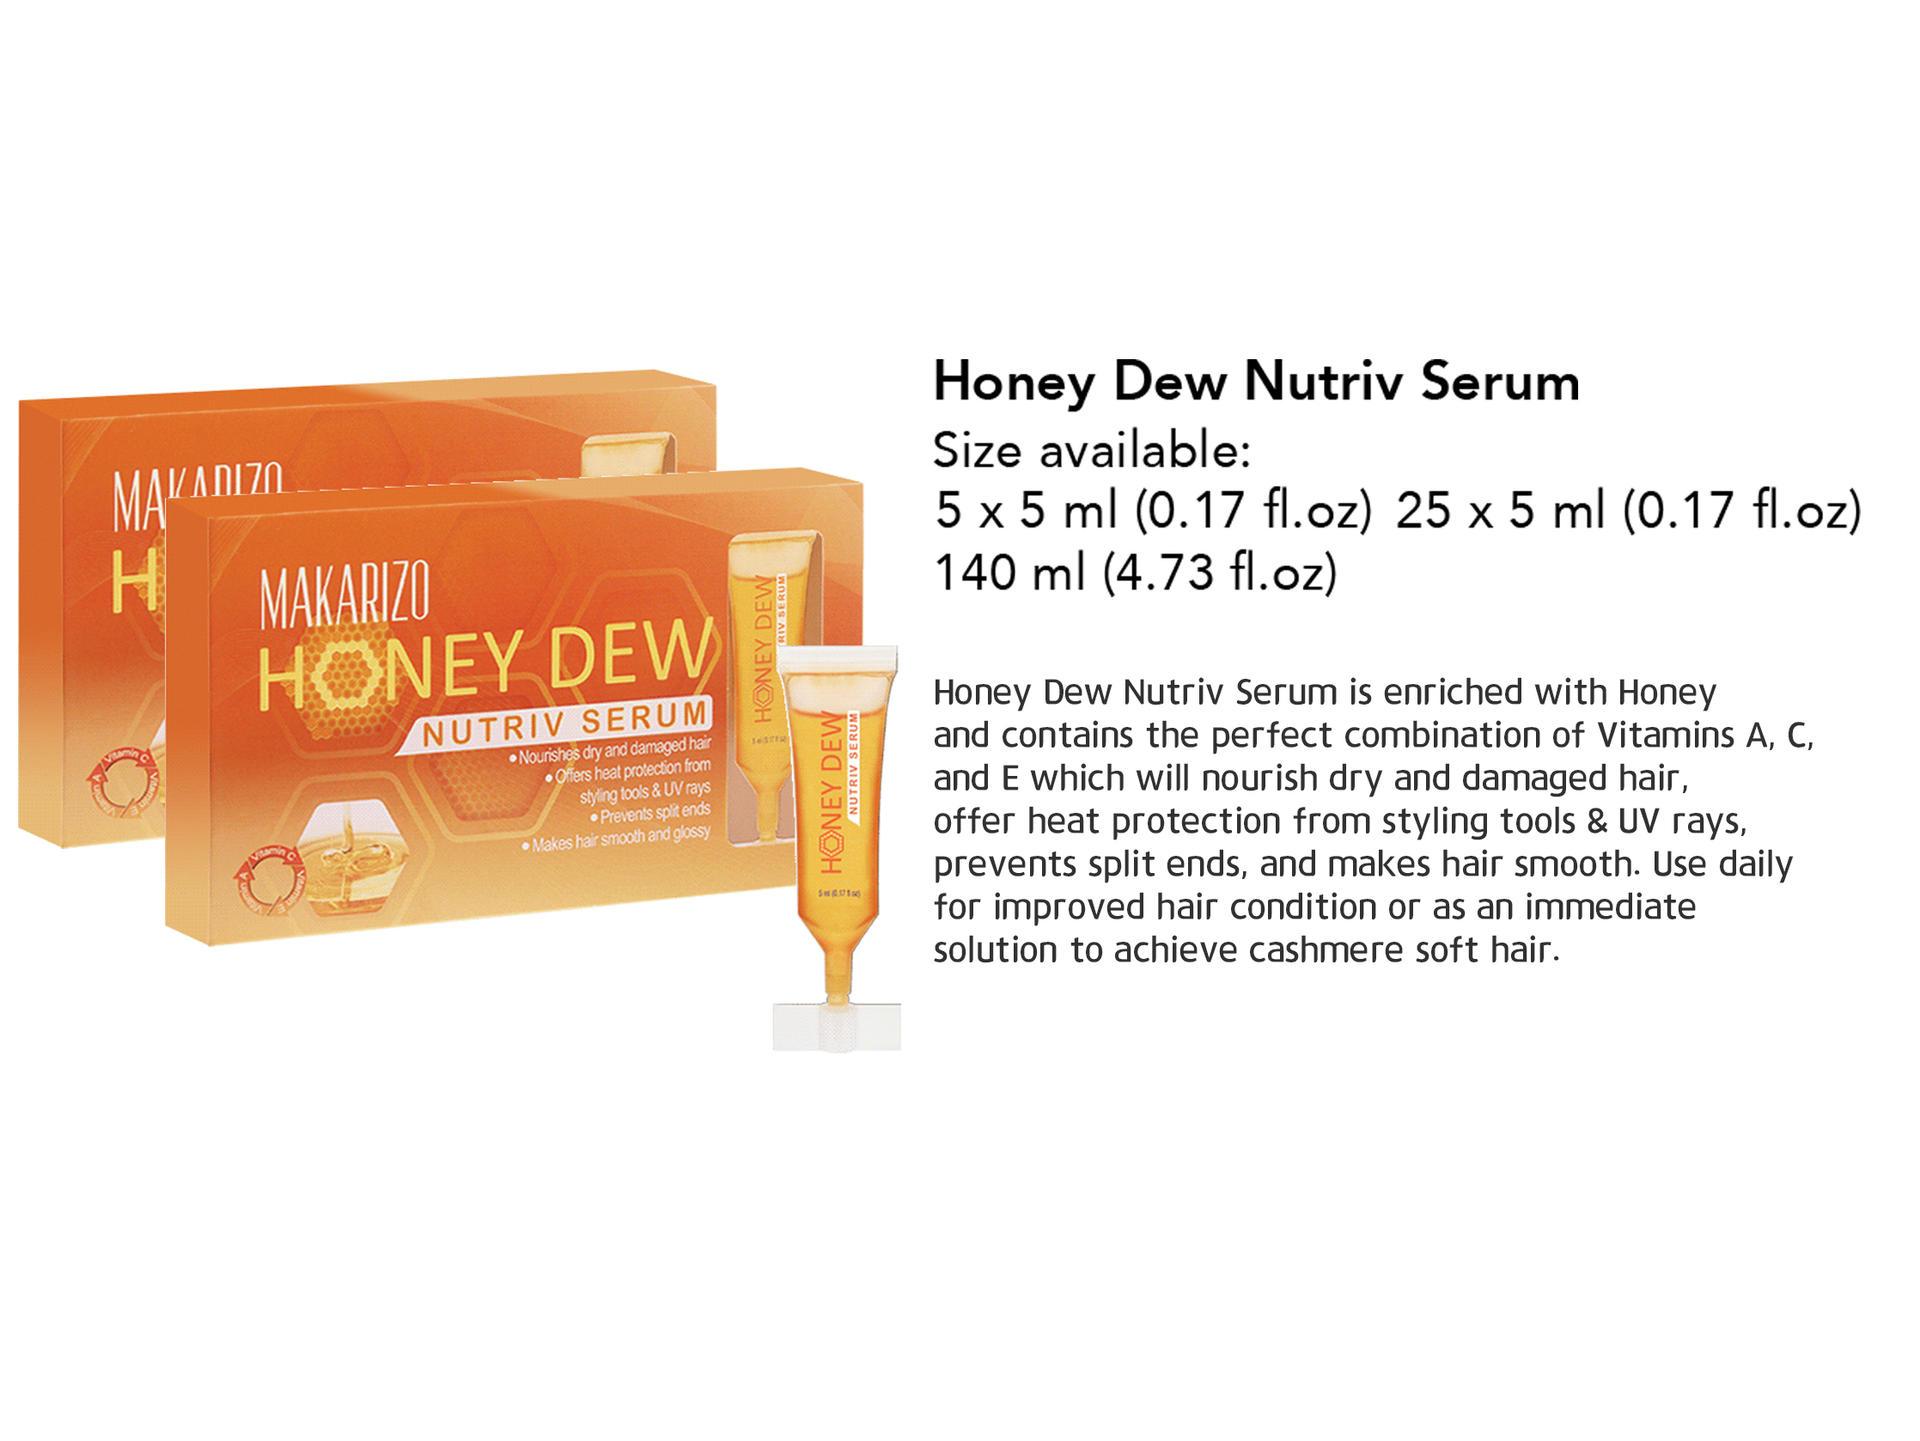 Makarizo Honey Dew Serum Nutriv